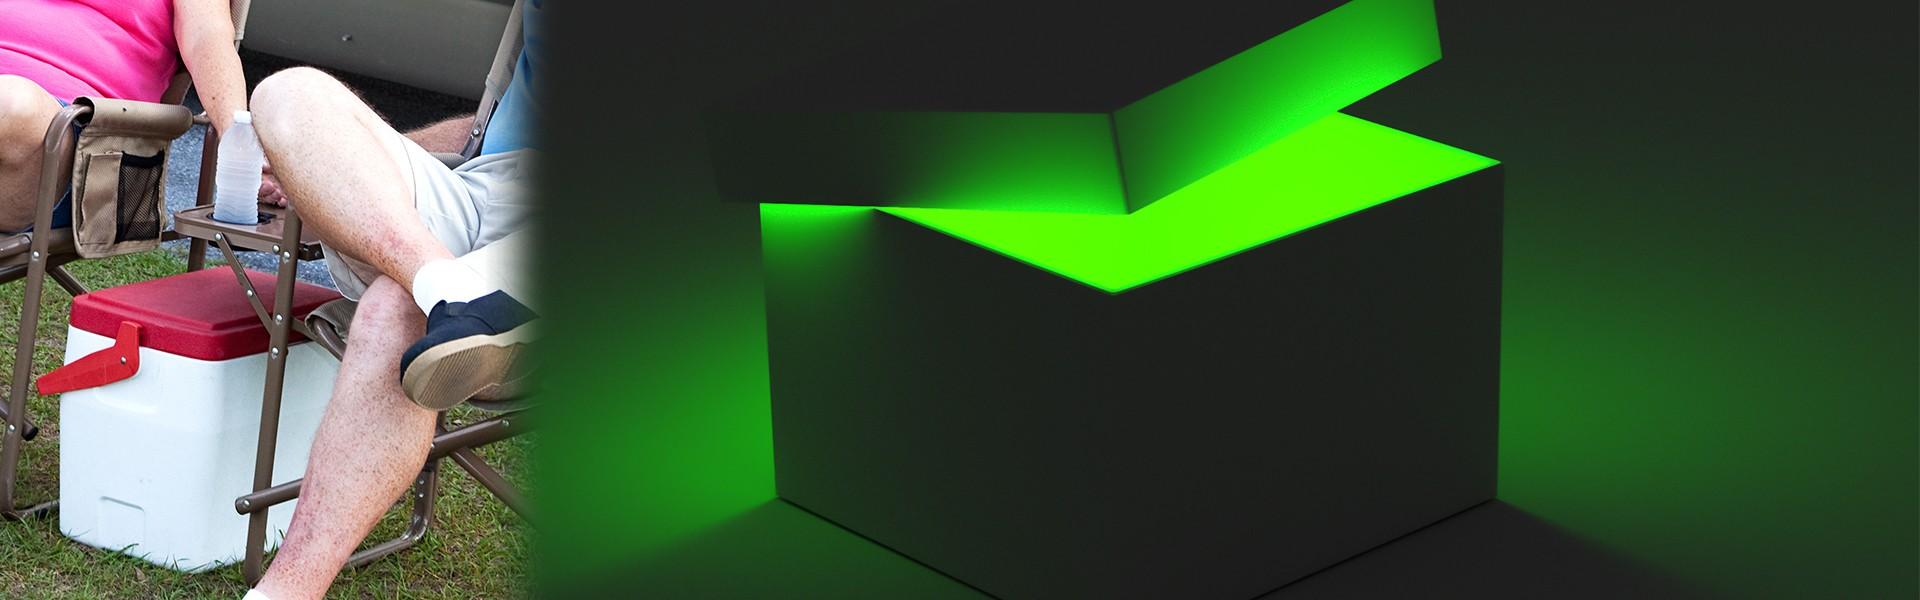 glowing green cooler